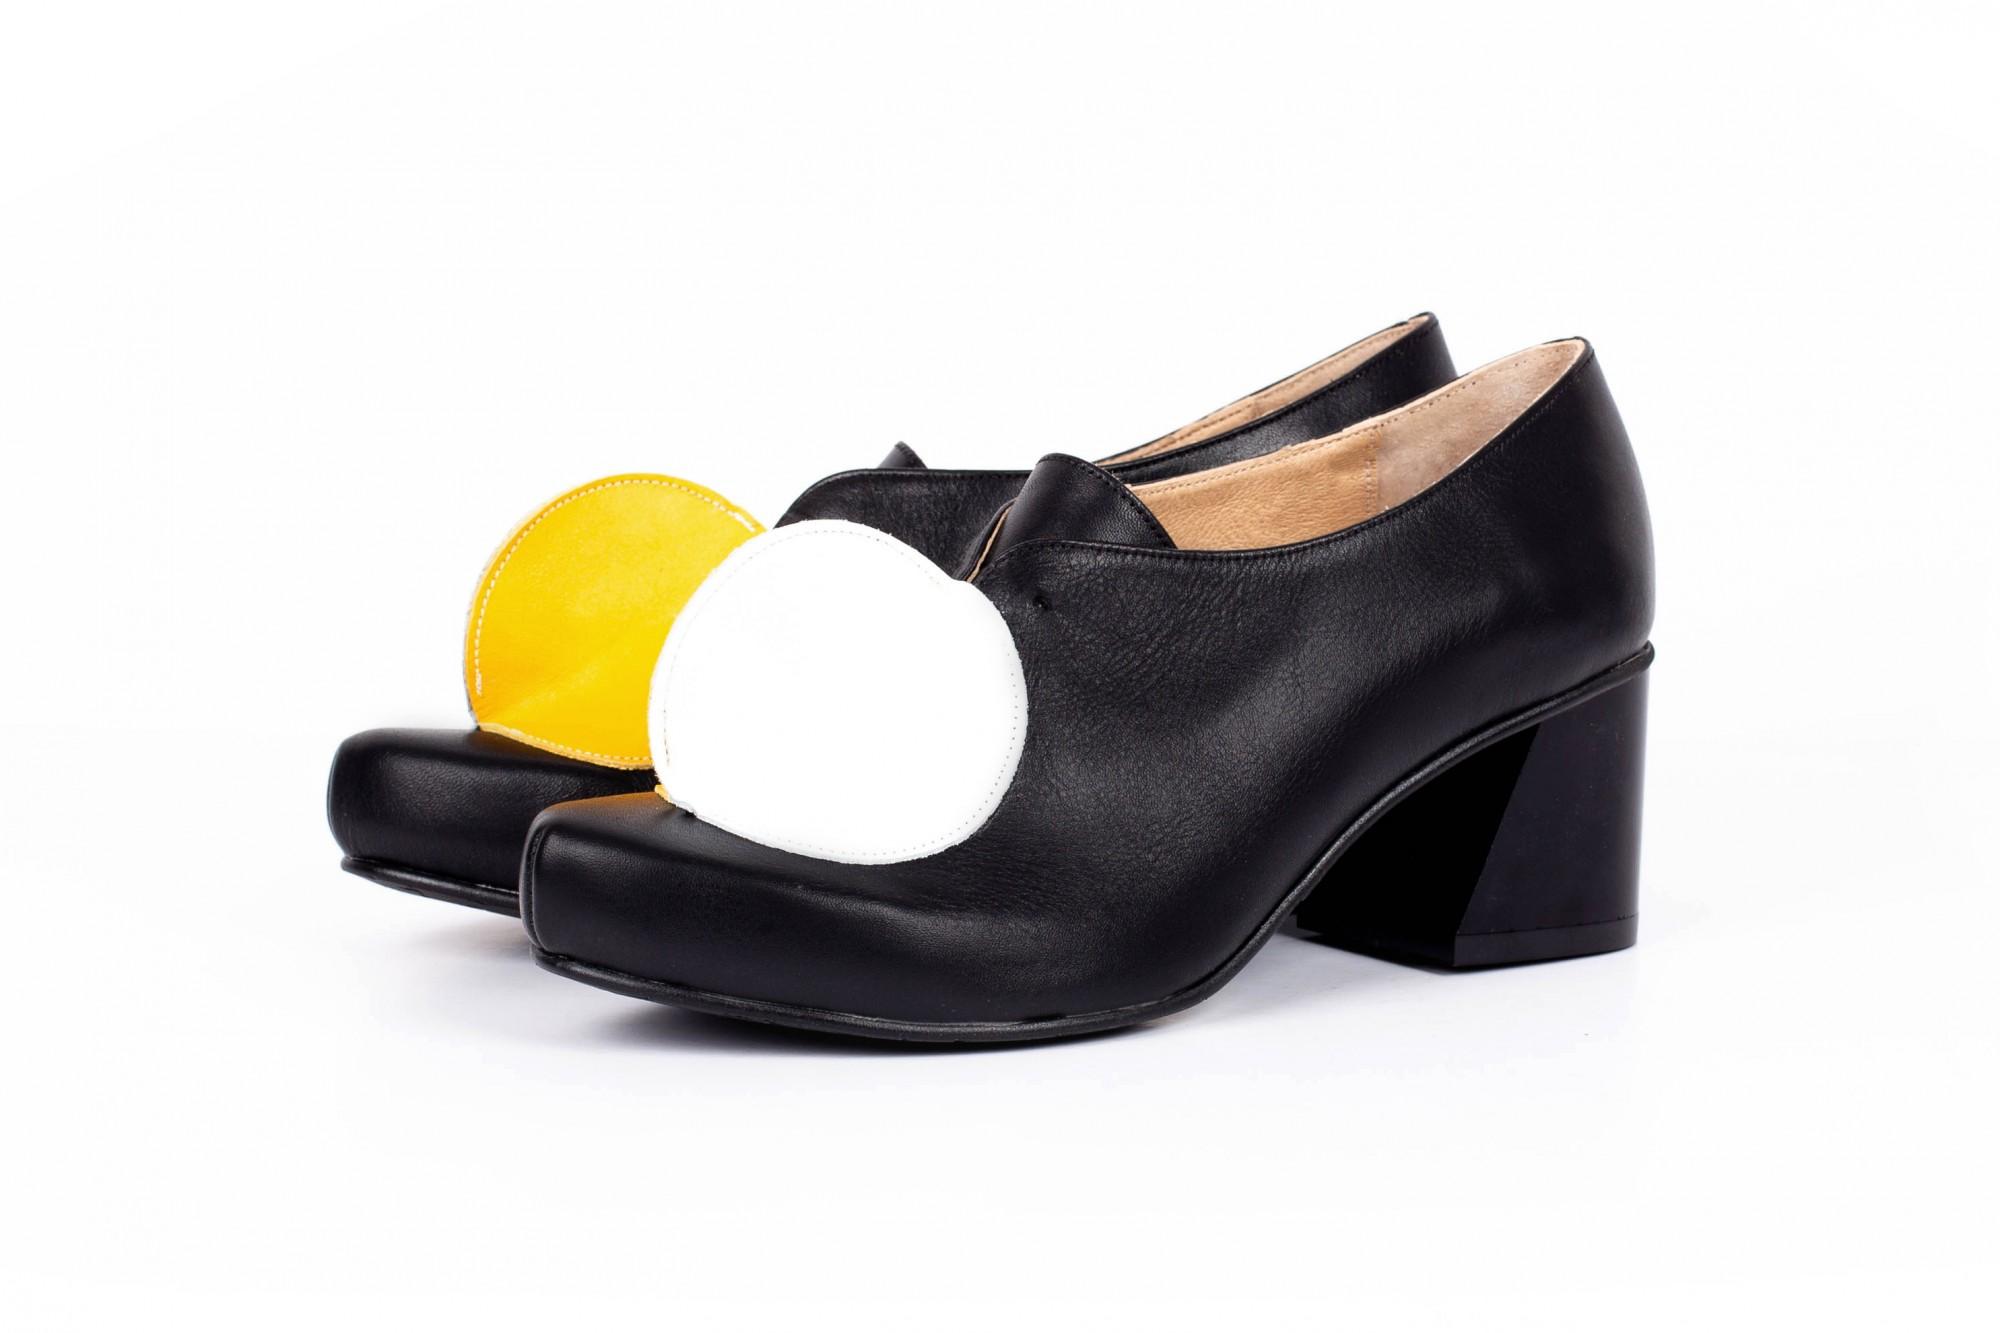 516526319a8 High heel fashion shoes